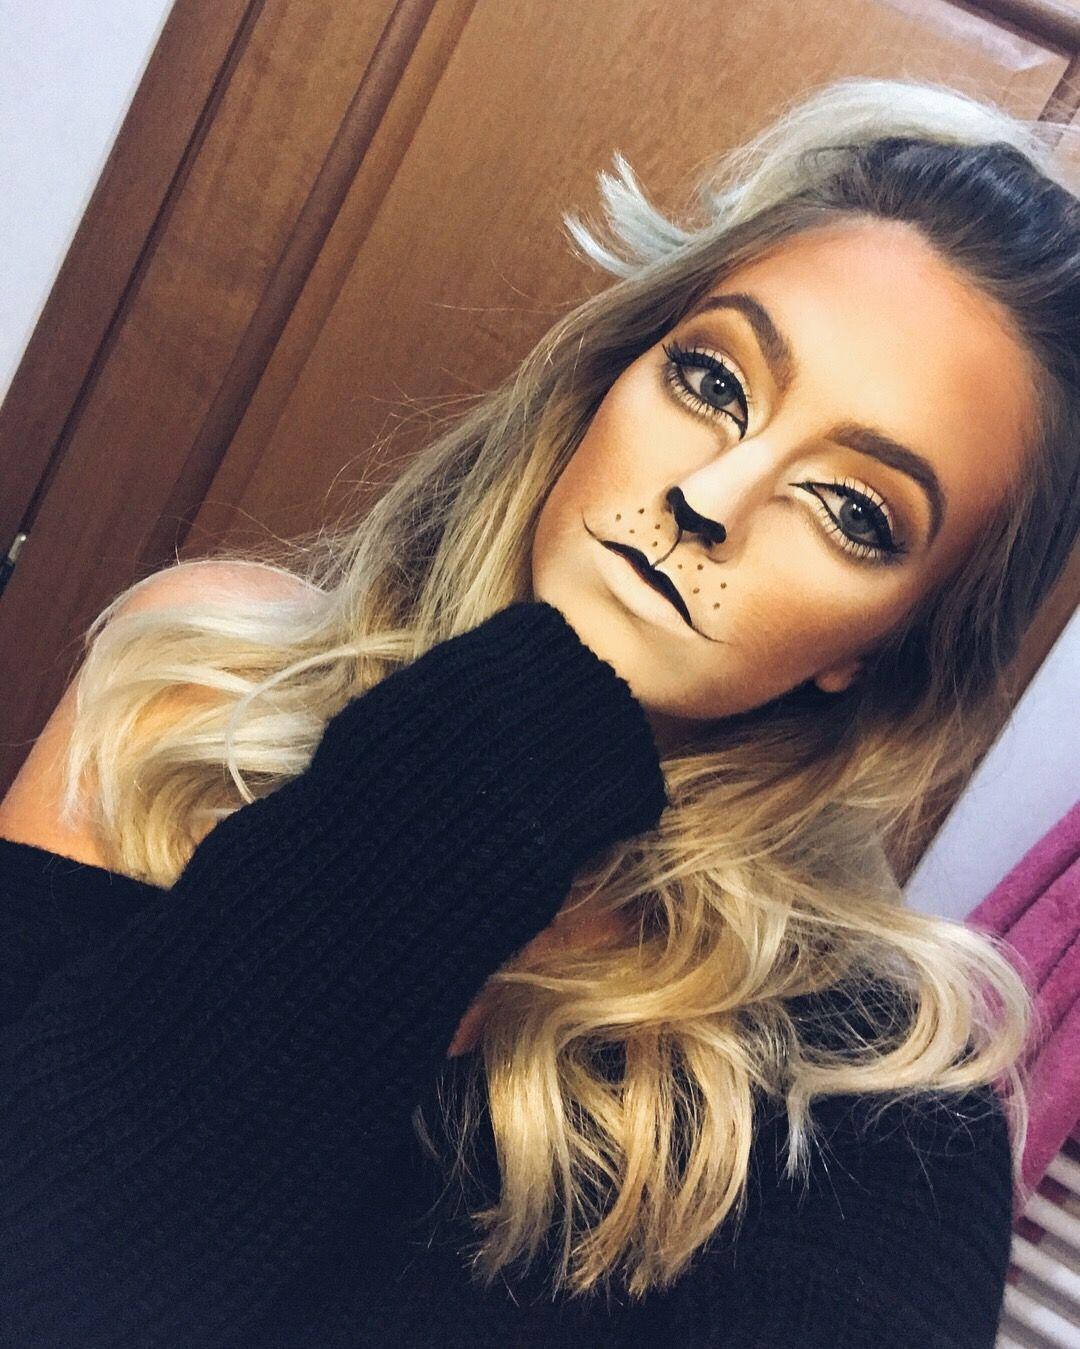 Lion Halloween costume makeup  sc 1 st  Pinterest & Lion Halloween costume makeup | Girl | Pinterest | Lion halloween ...